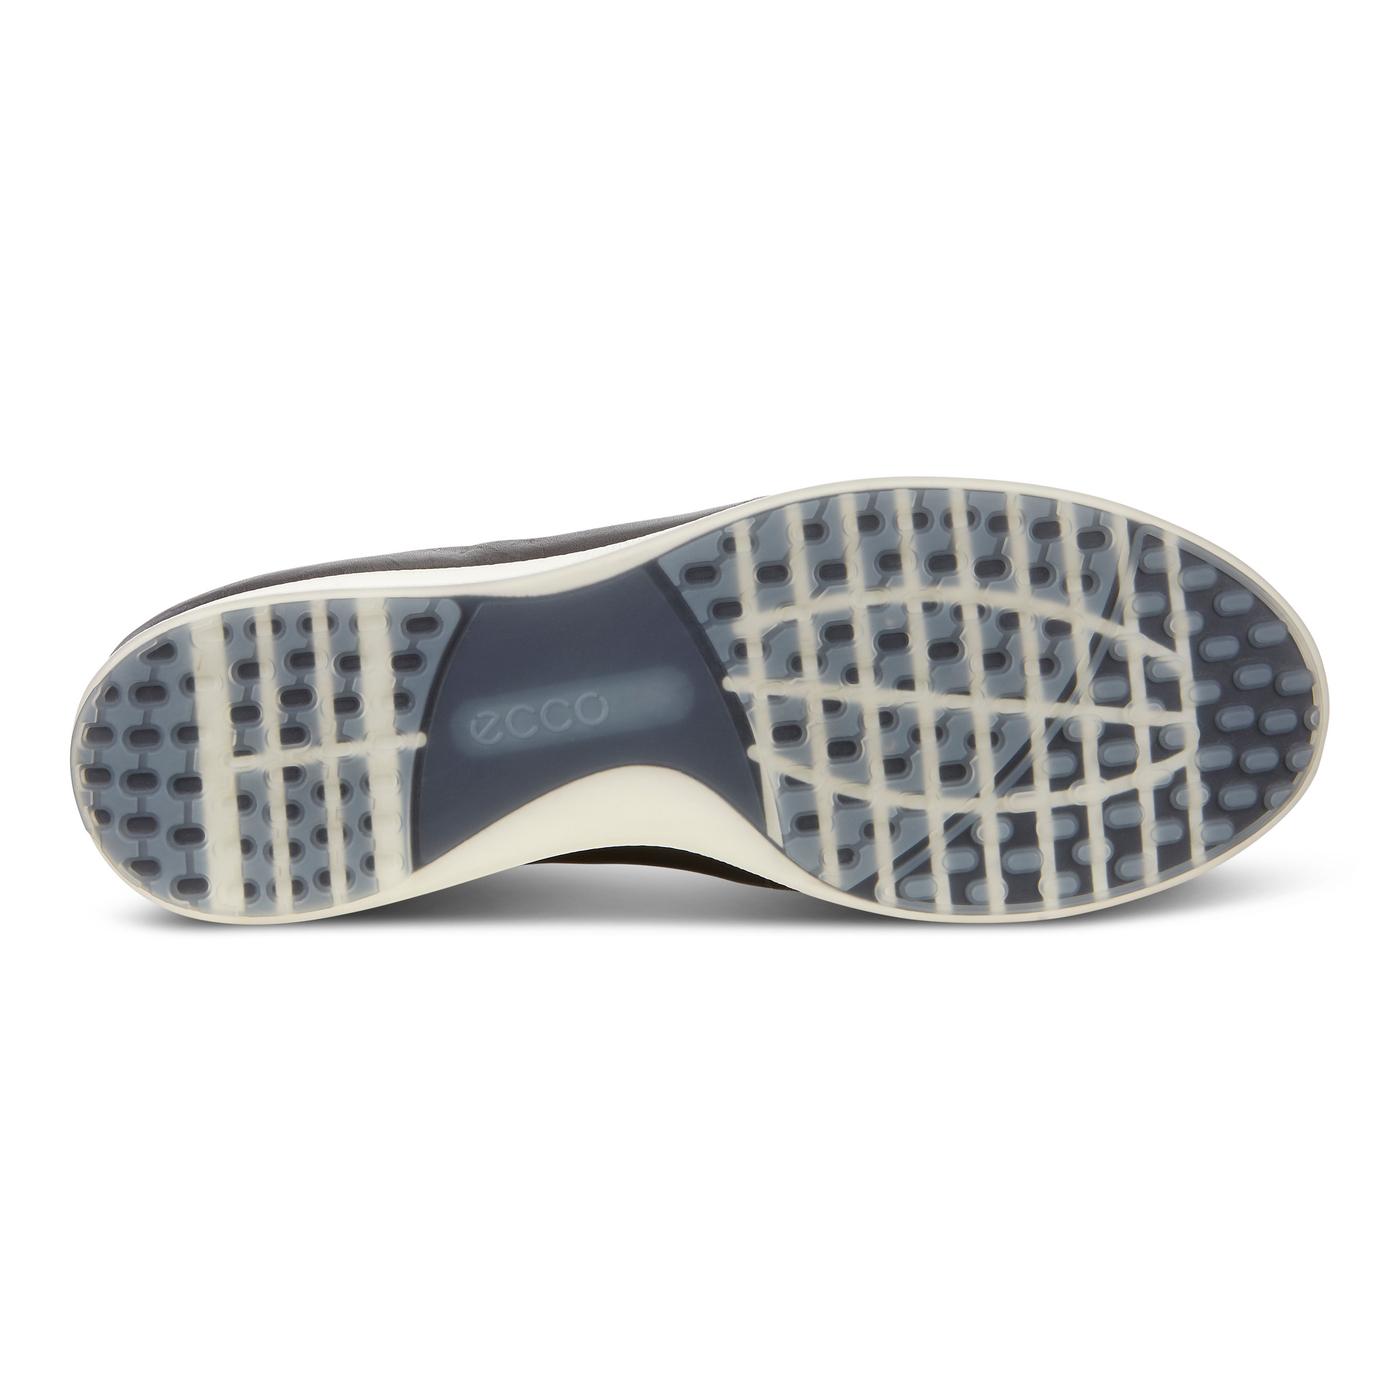 ECCO COOL LADIES Shoe